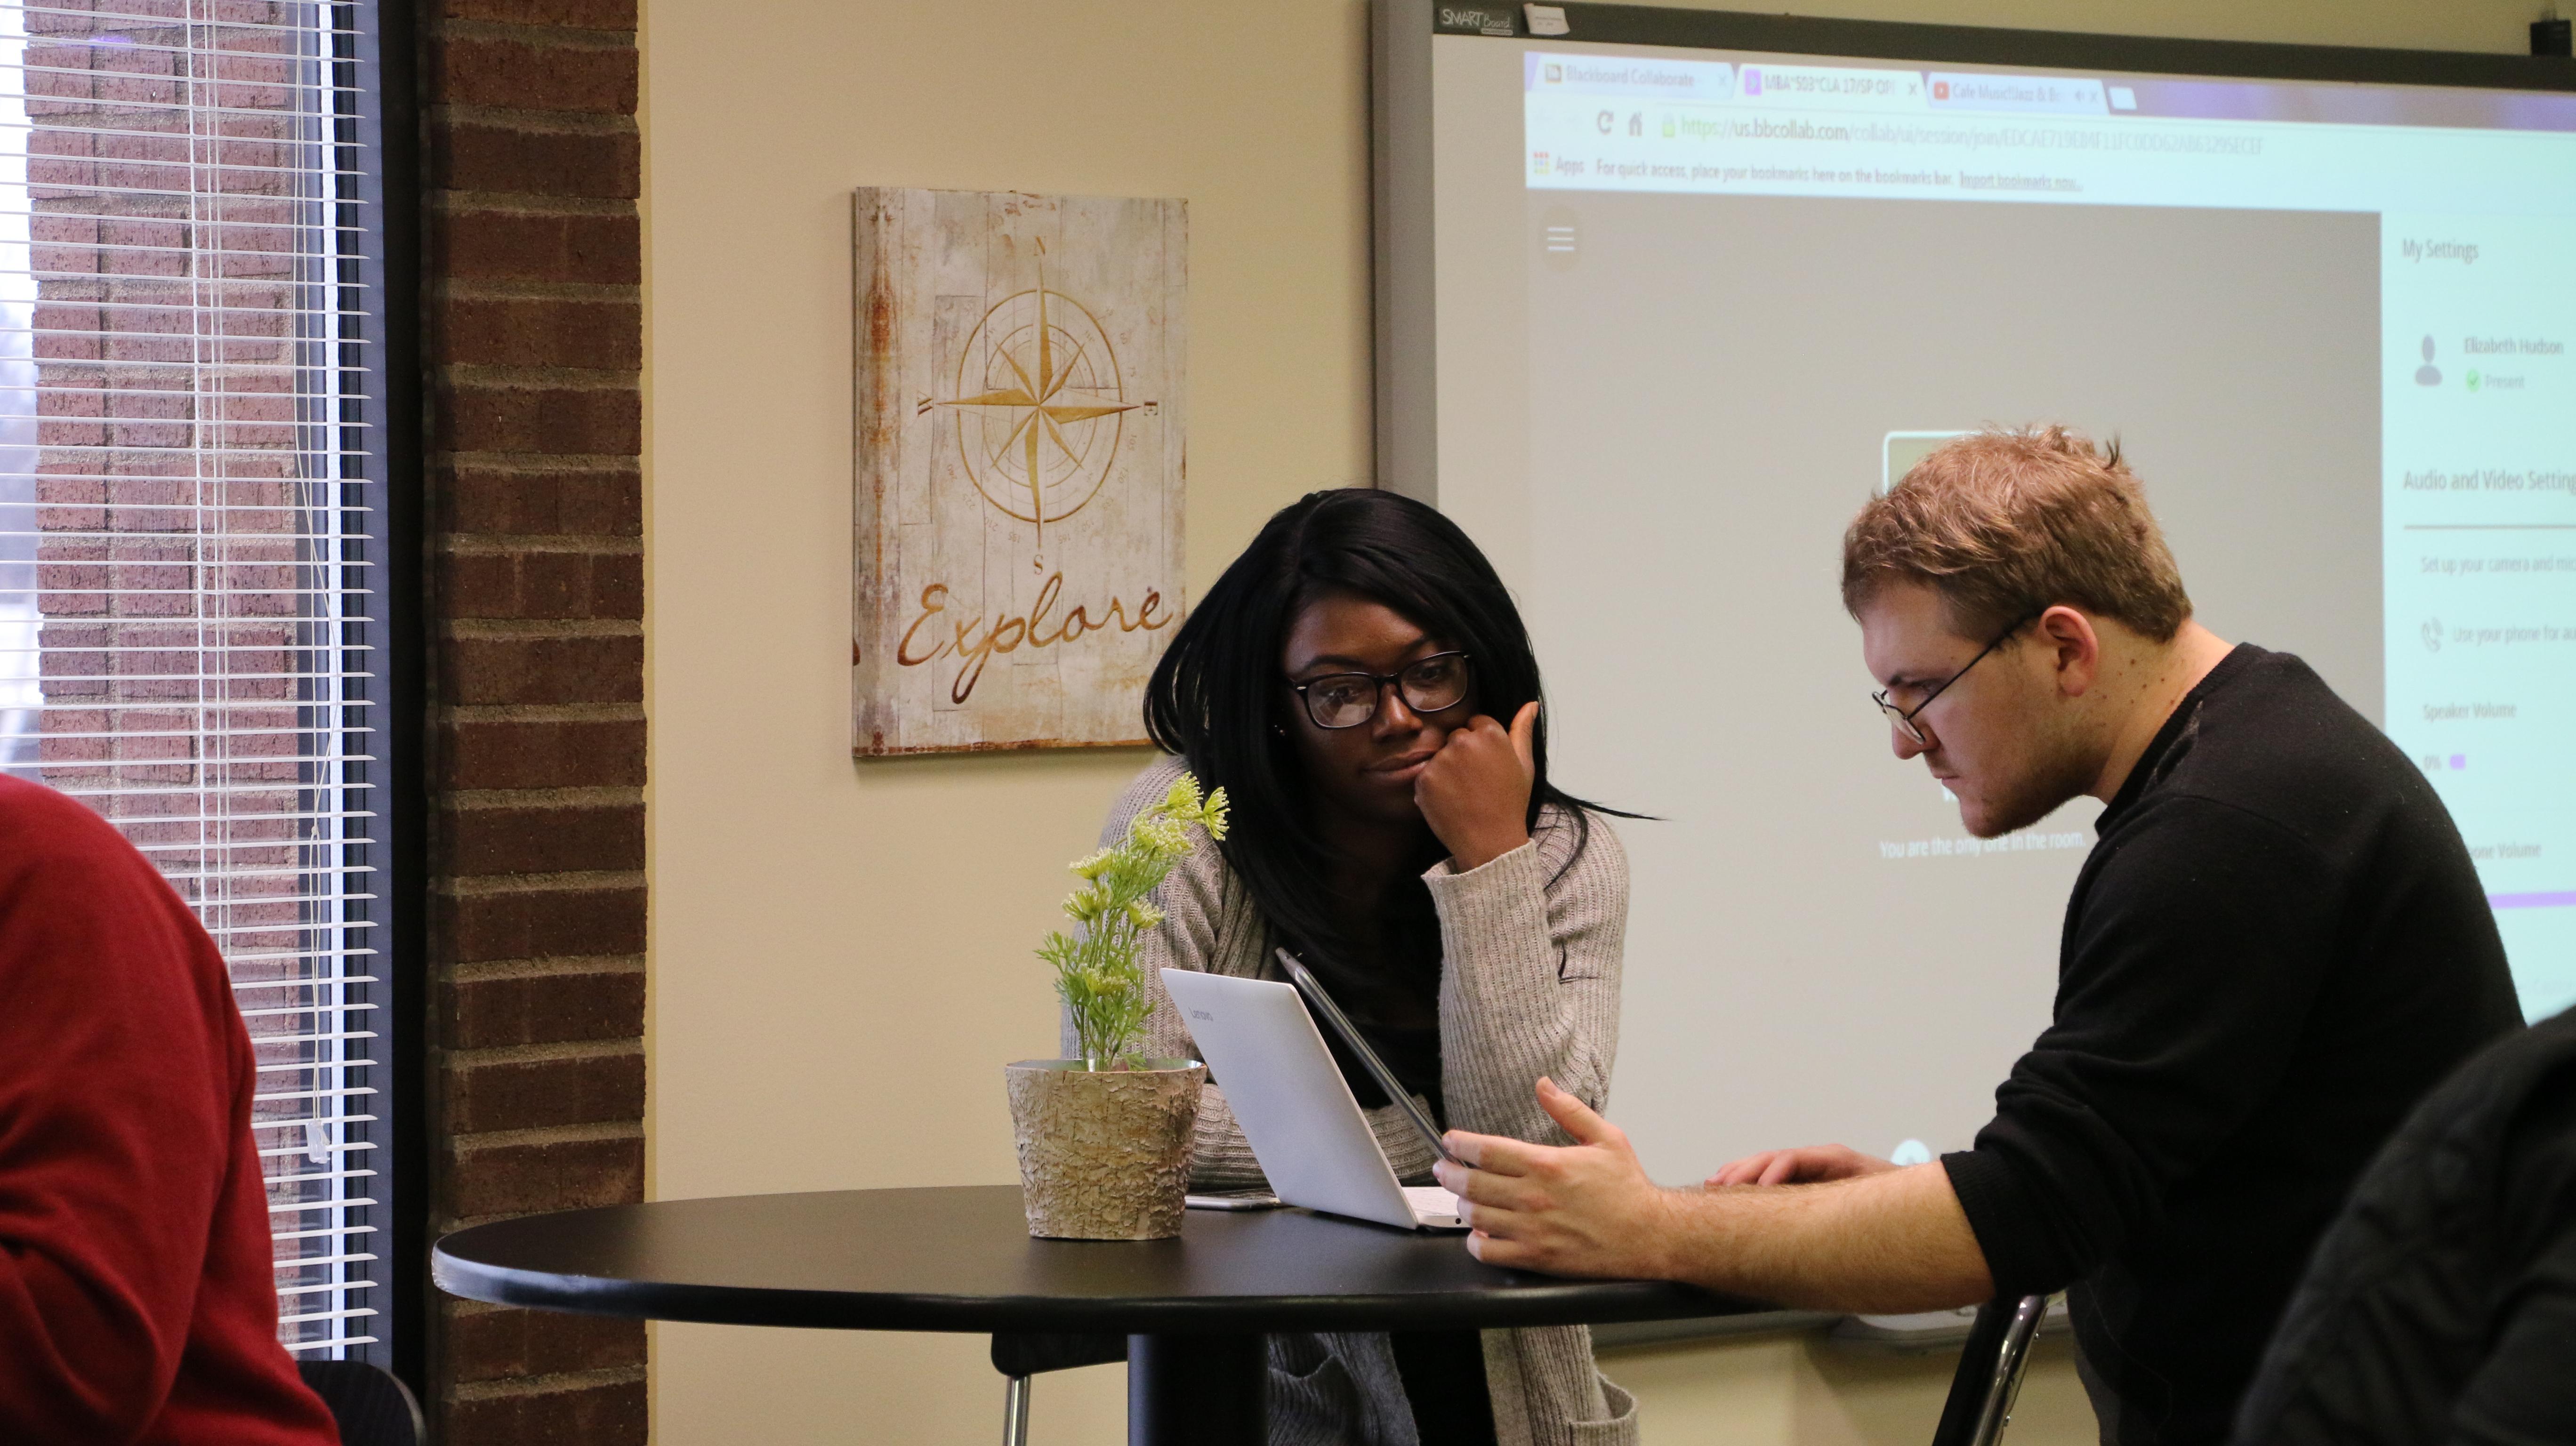 Columbus Students